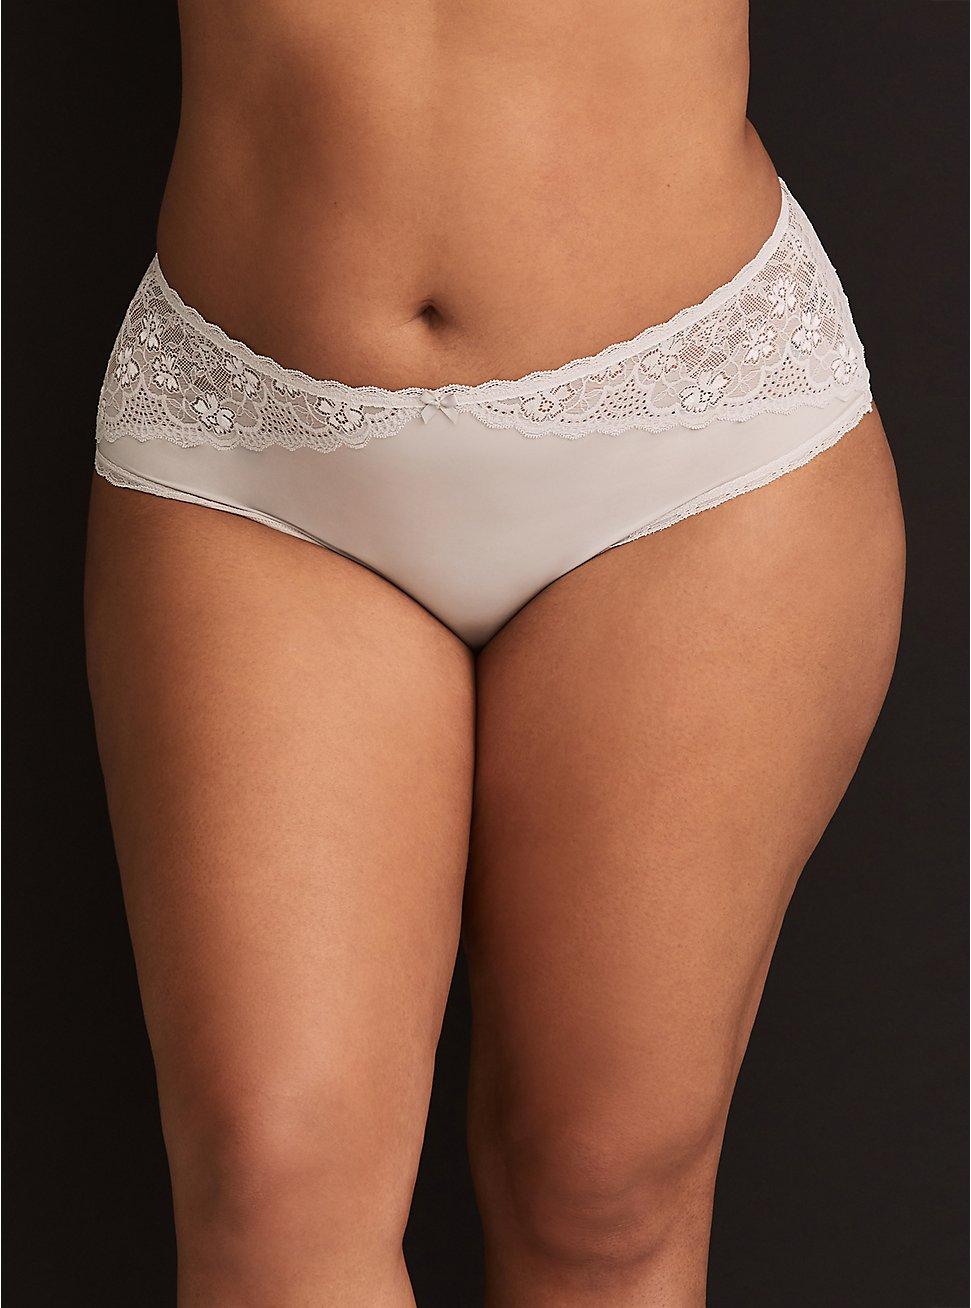 Light Grey Microfiber & Lace Cheeky Panty, LIGHT GRAY, hi-res